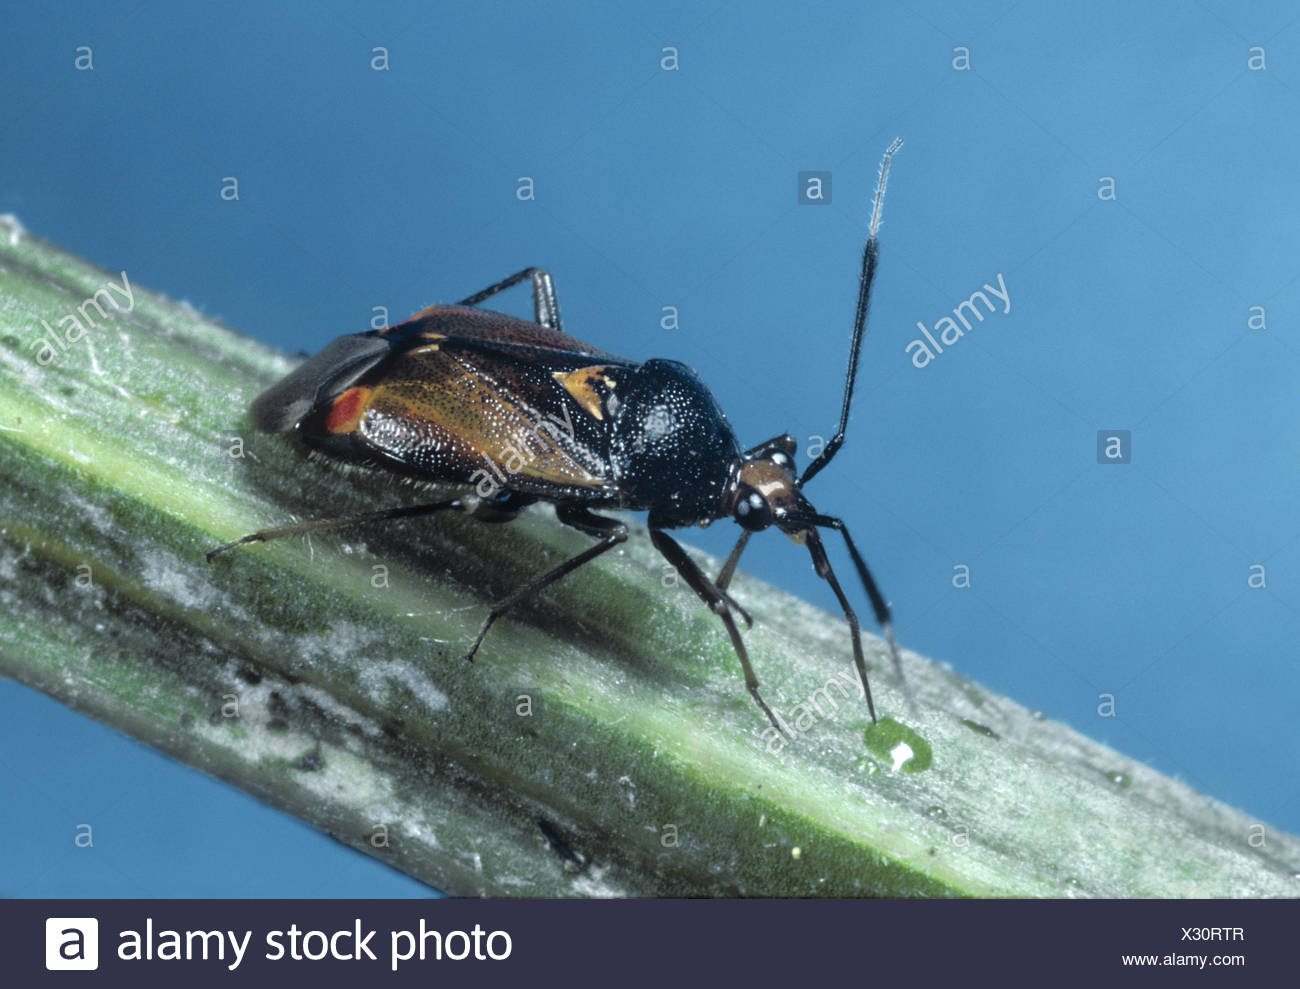 Capsid Bug - Deraeocoris ruber - Stock Image